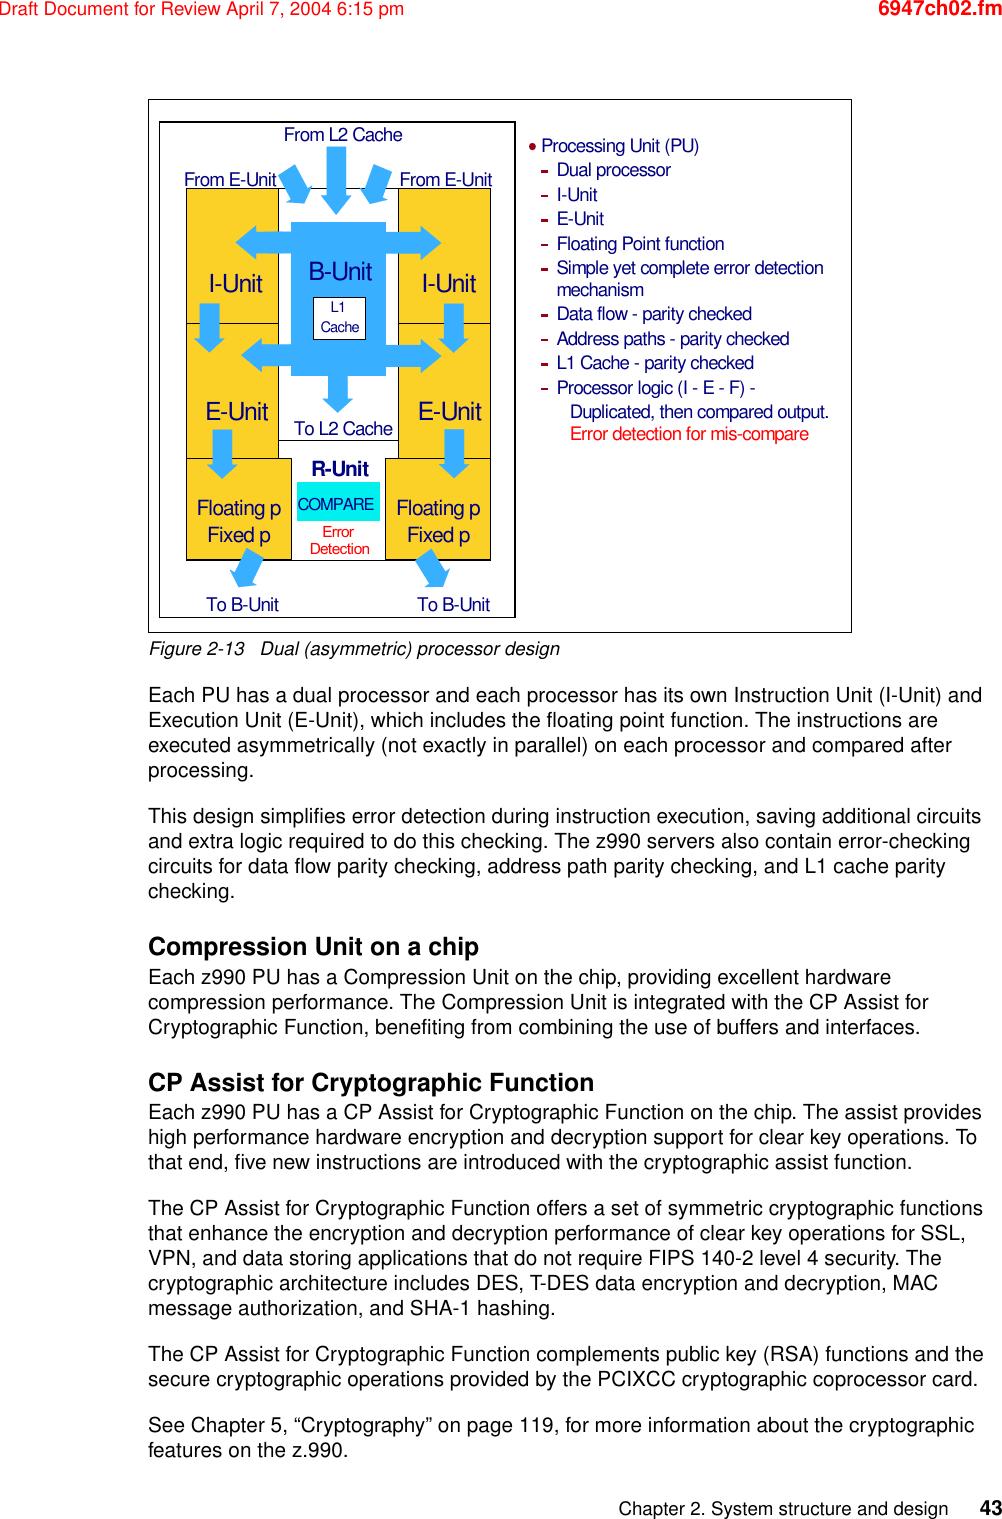 Ibm 990 Users Manual SG246947